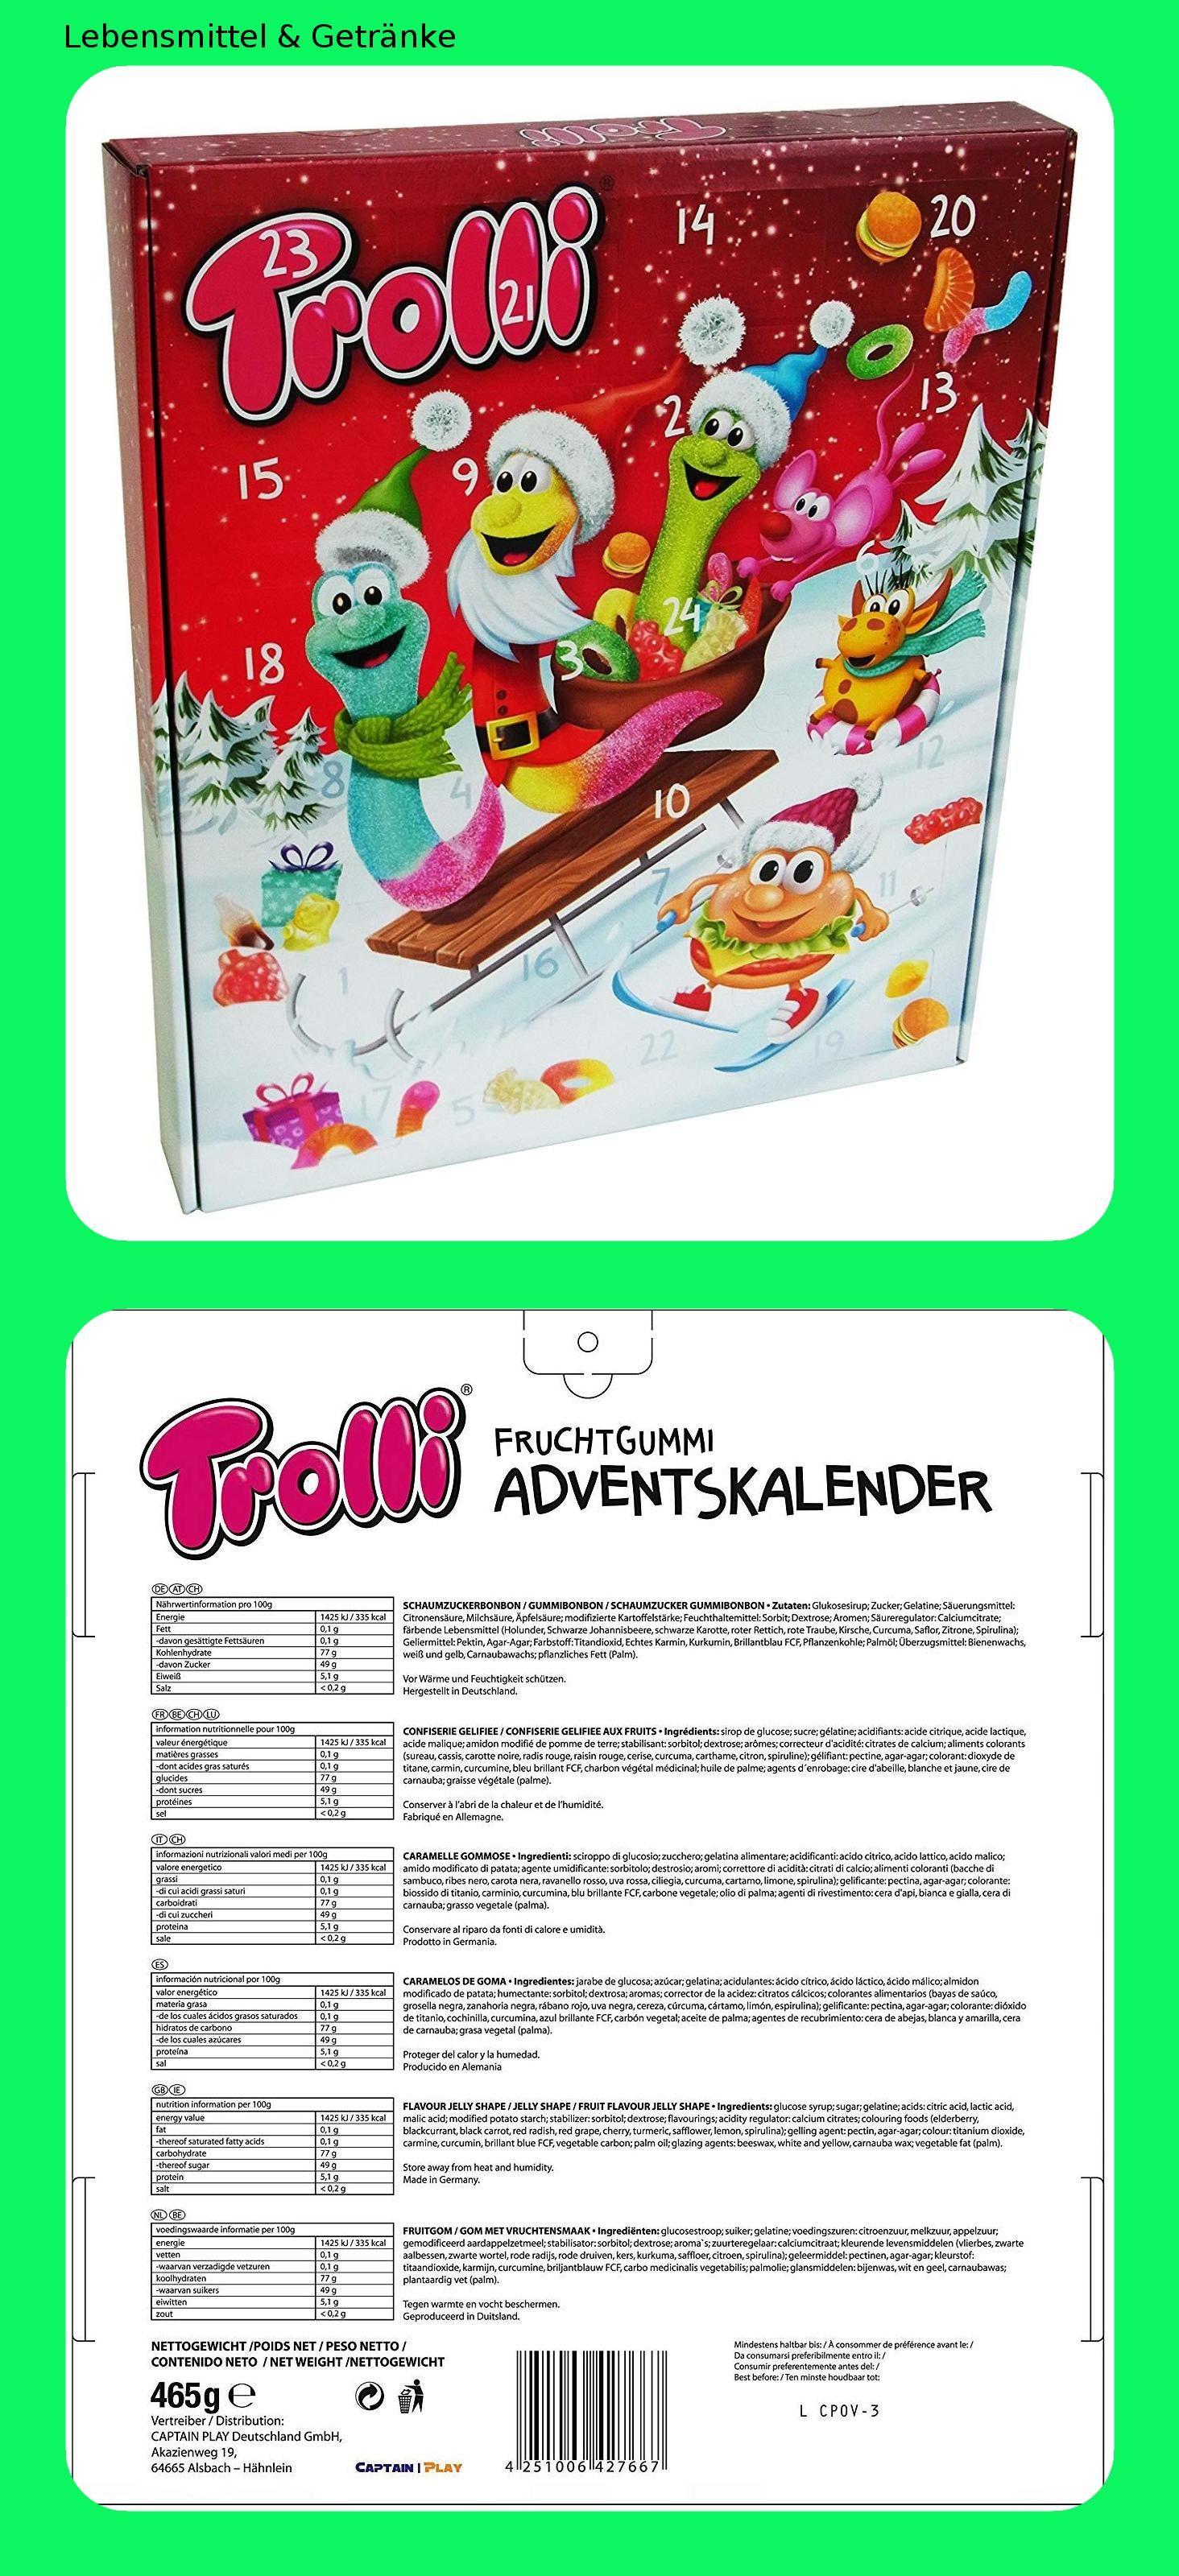 Trolli Adventskalender 1er Pack 1 x 465g